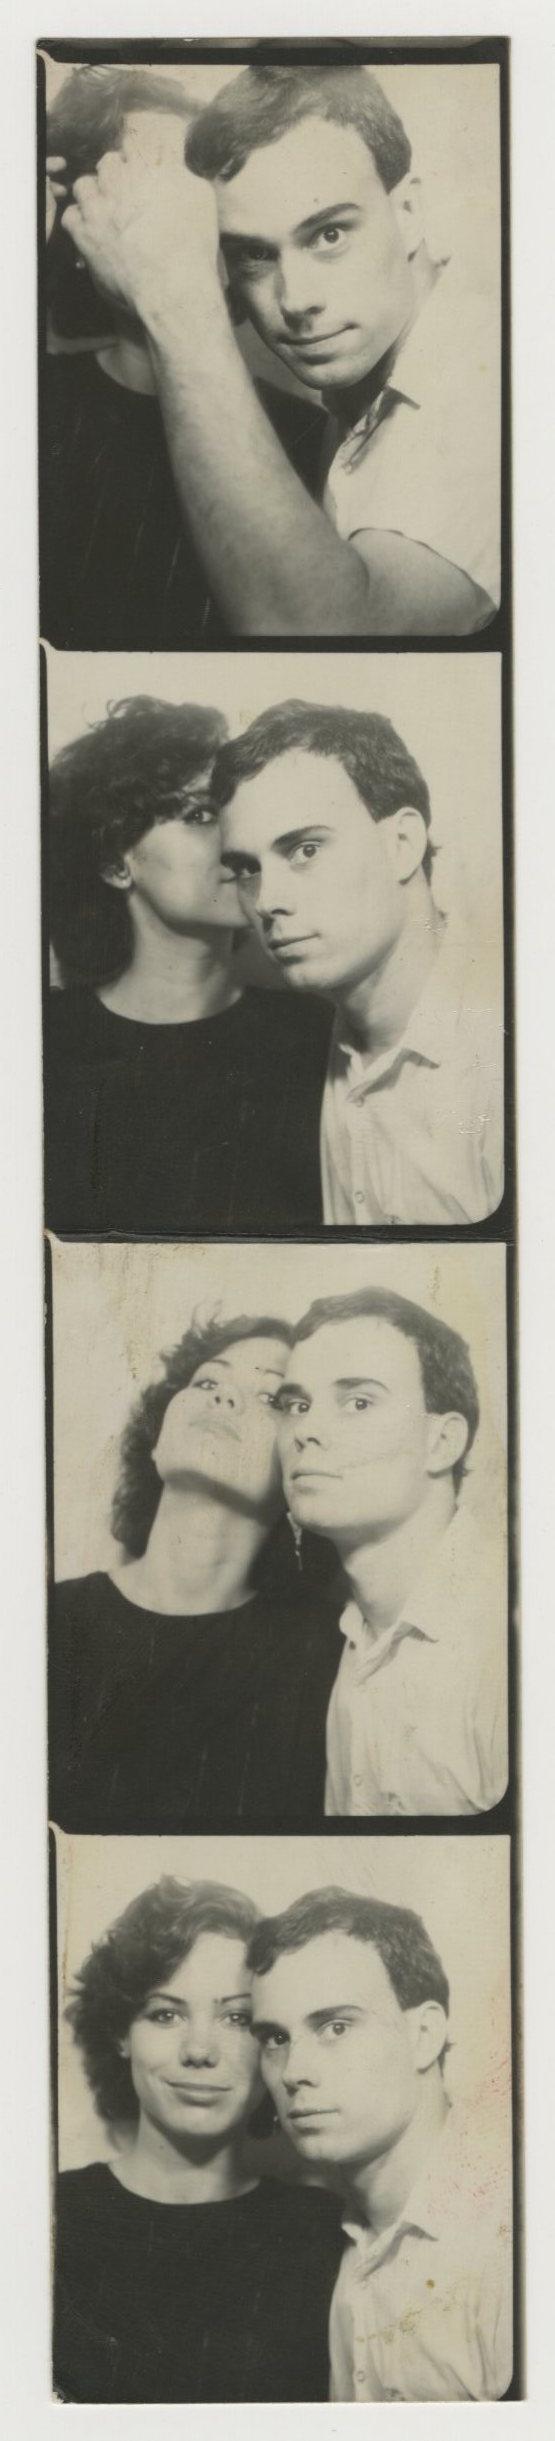 Photo booth strip: Ed Smith and Mary Emerzian, circa 1981